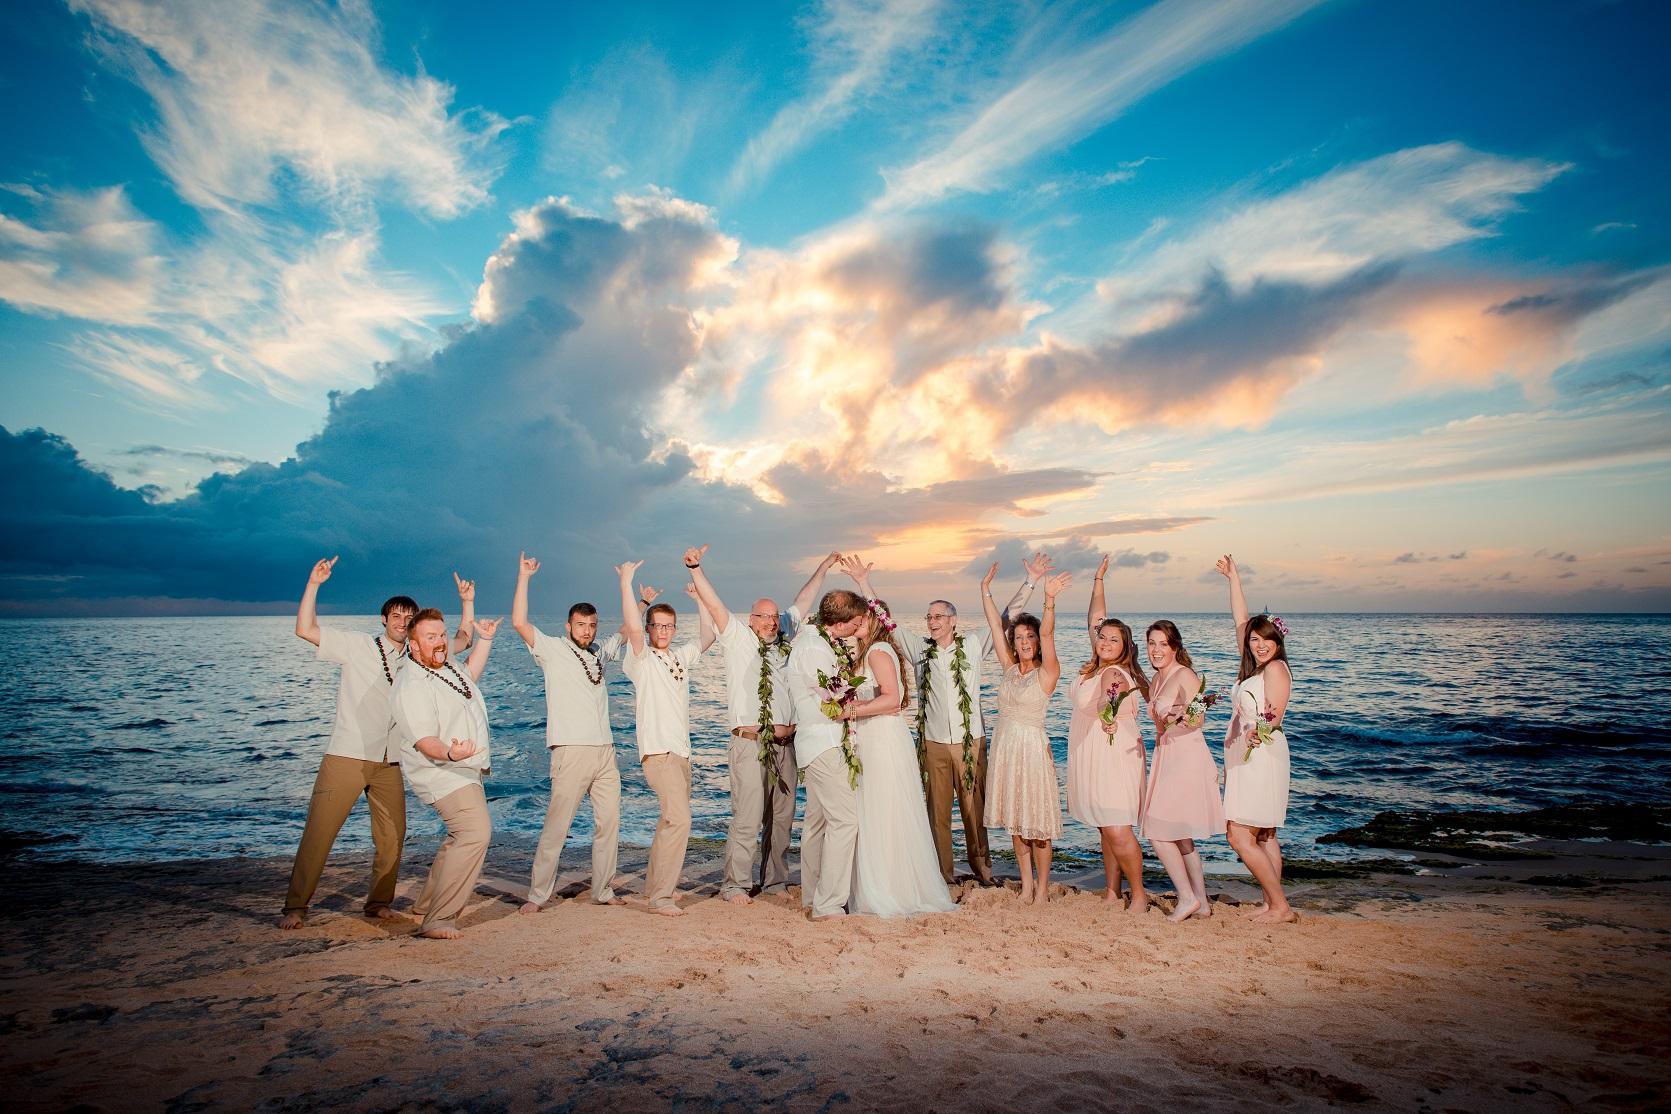 oahu beach wedding at sunset